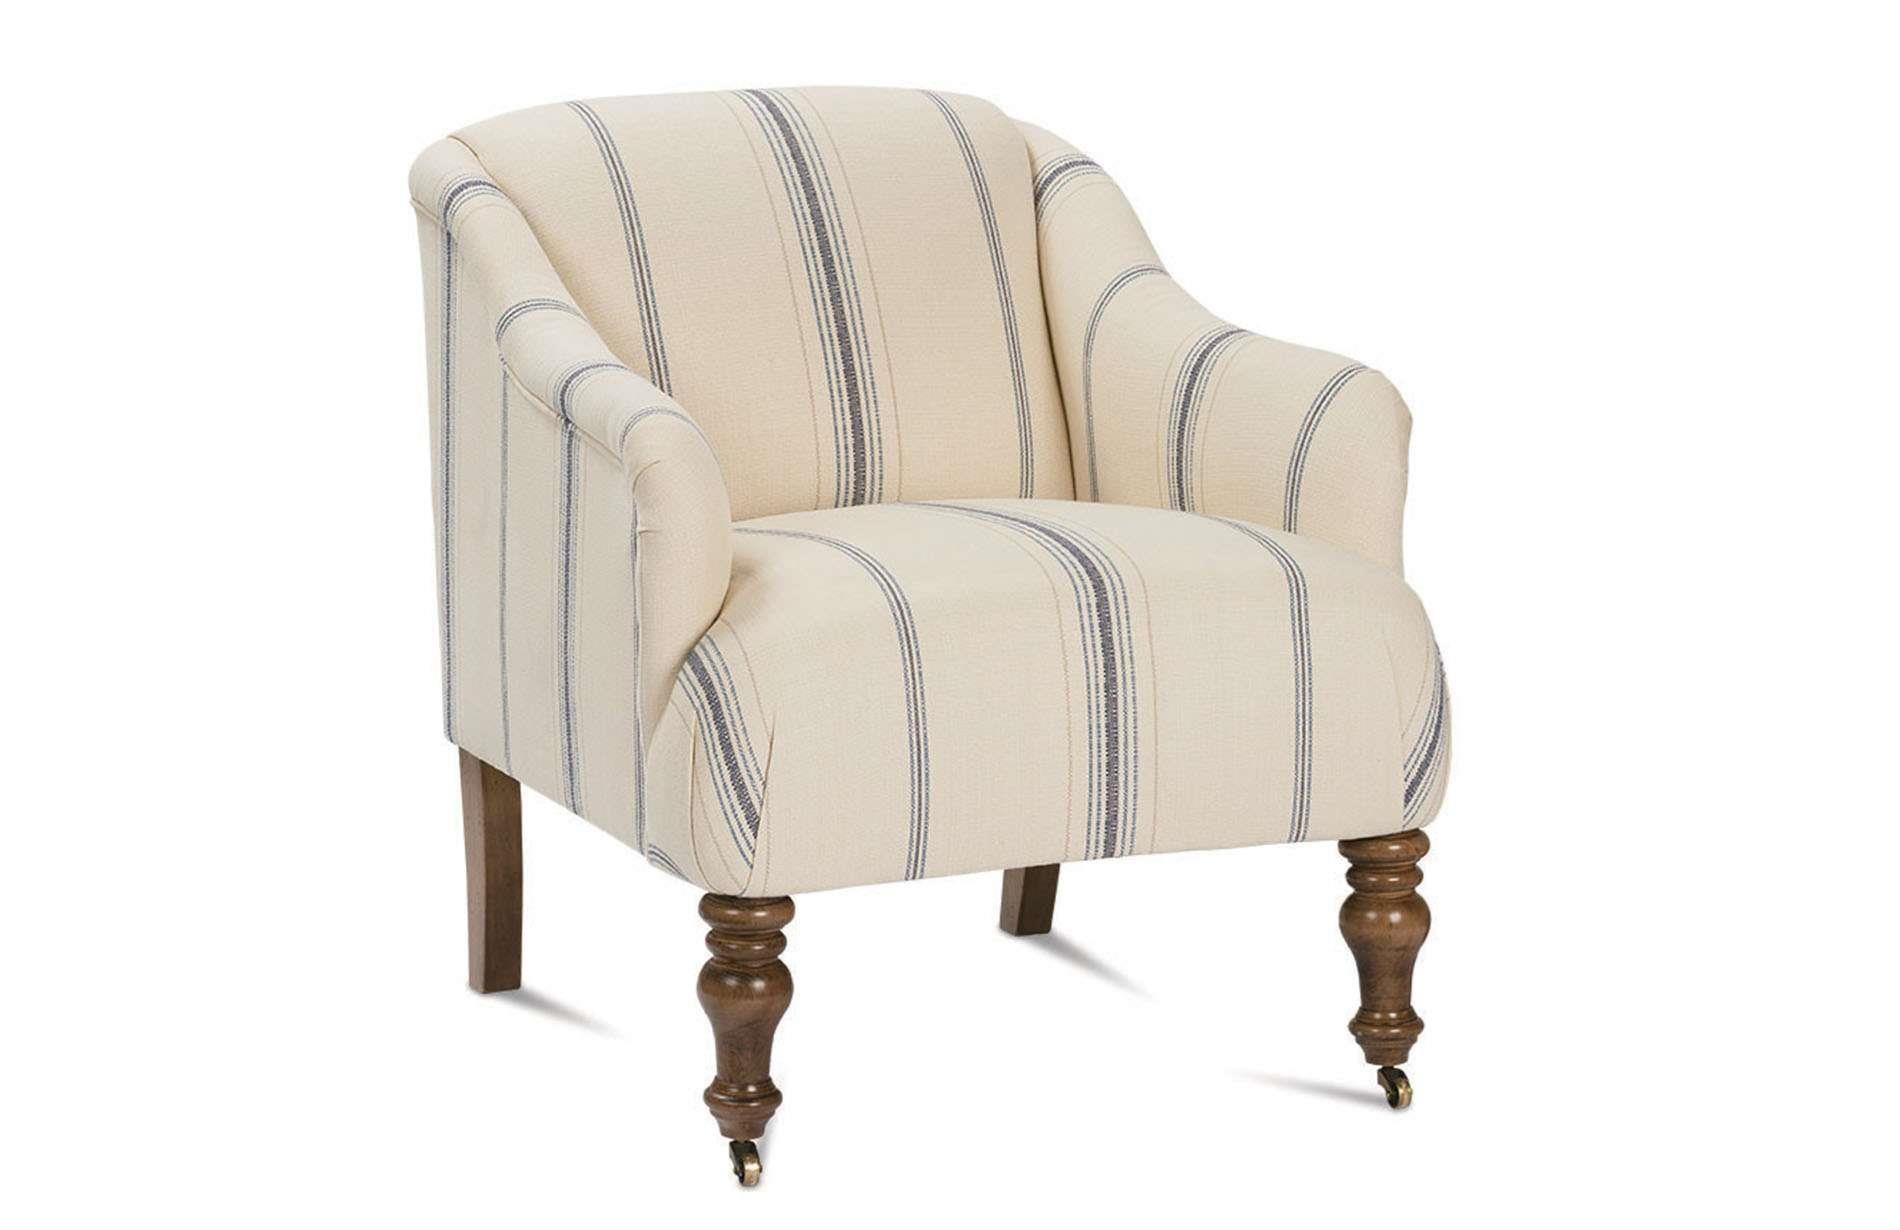 Robin Bruce Mackenzie Upholstered Chair - Item Number: Mackenzie-006